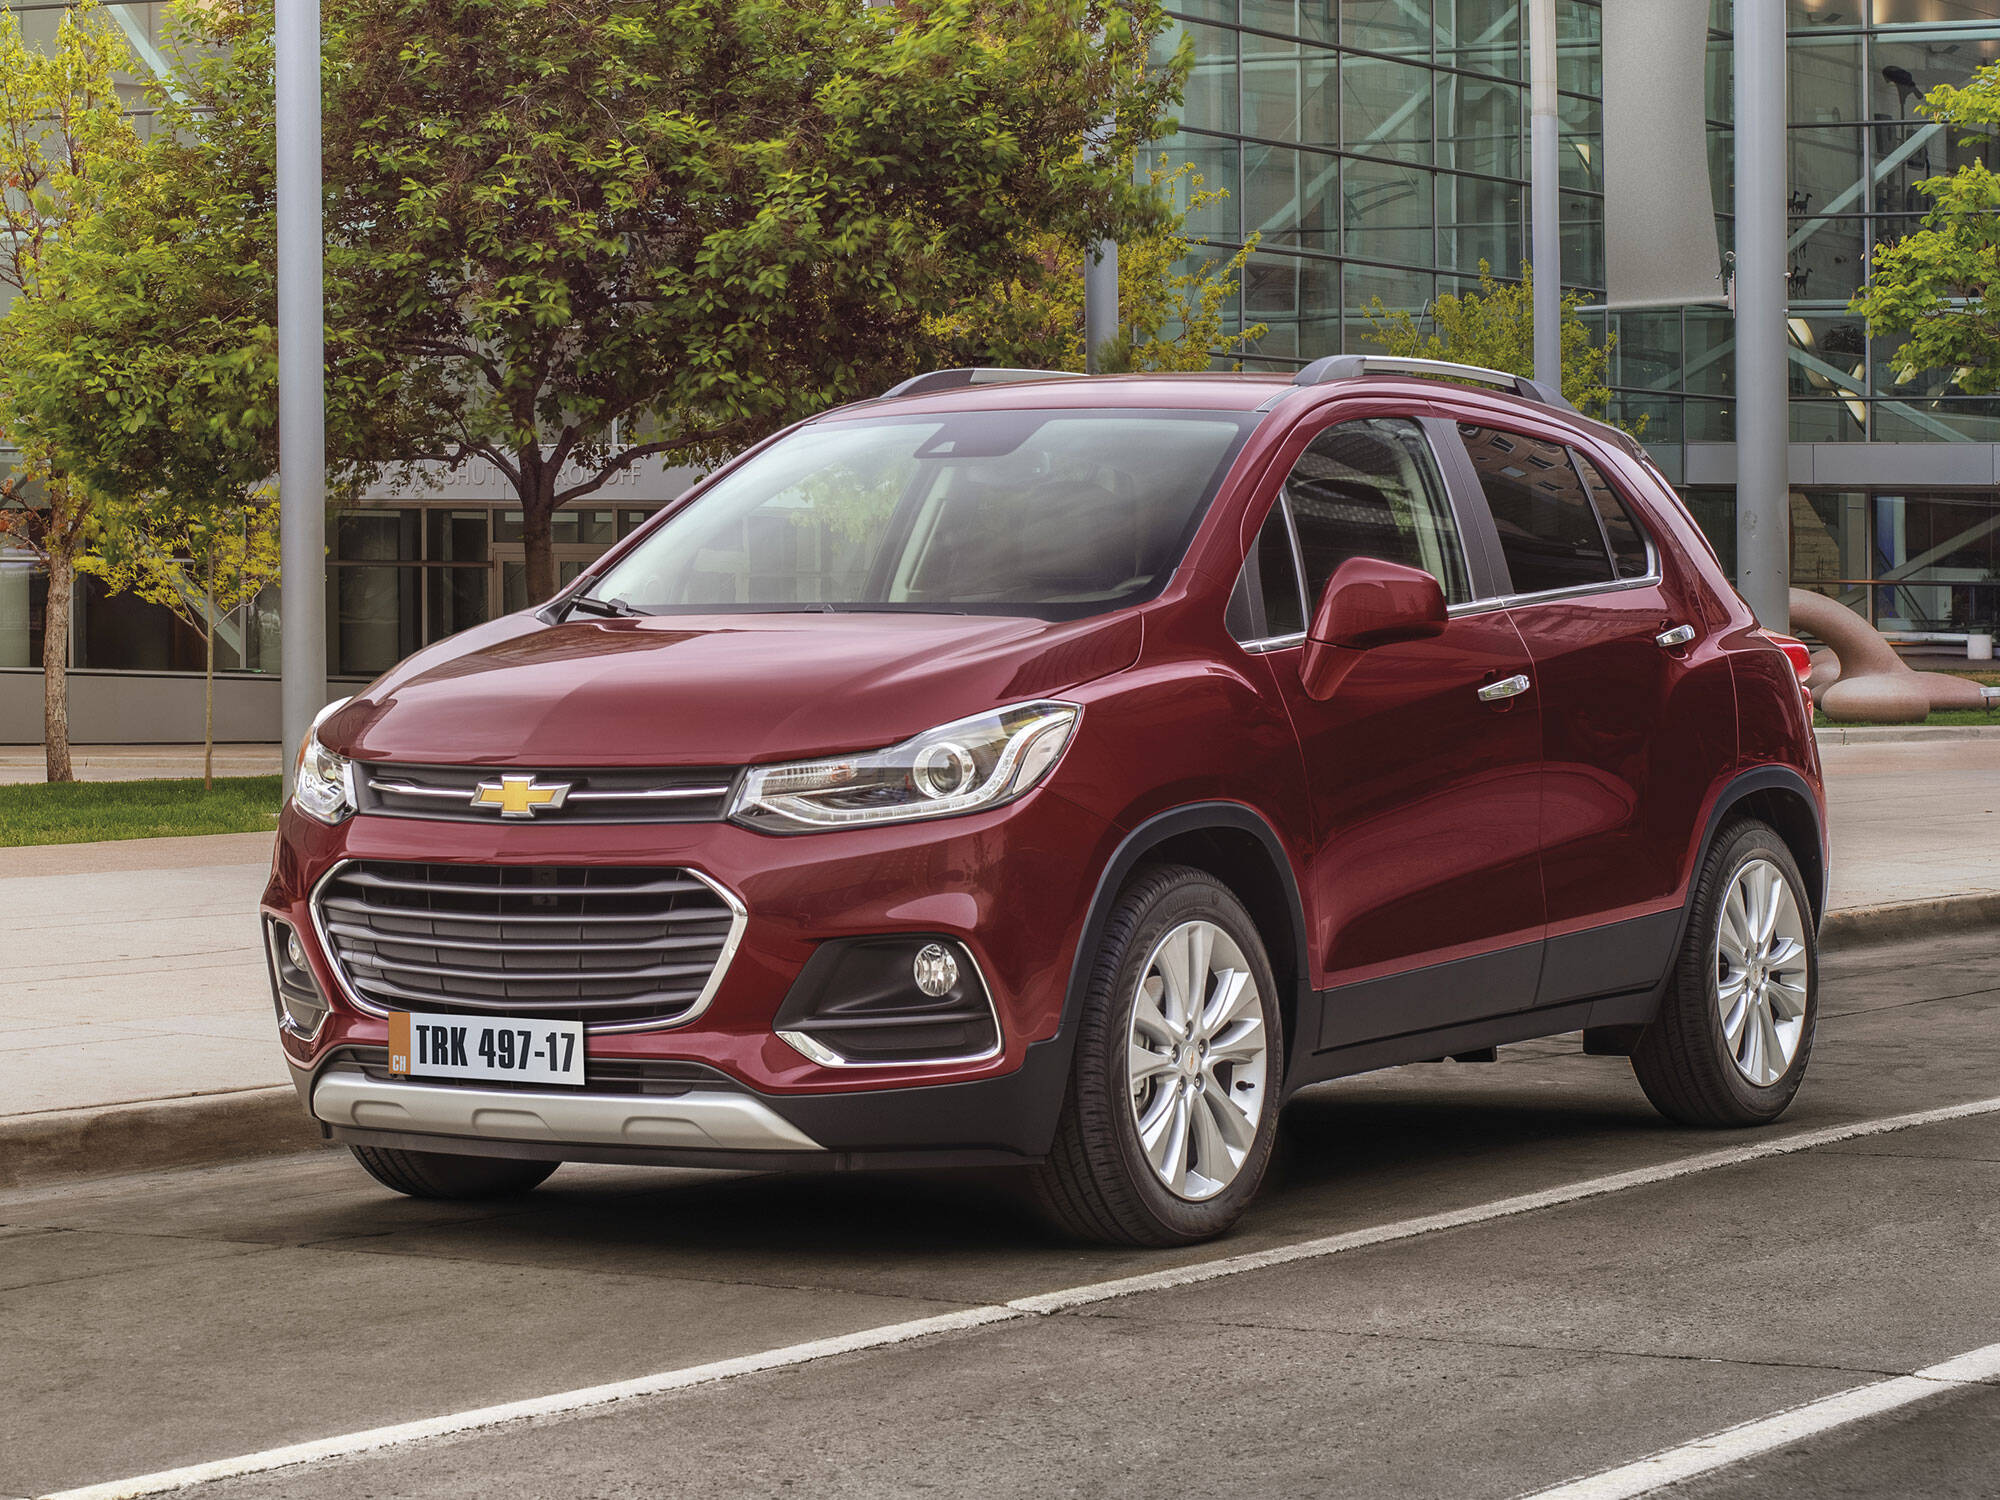 Chevrolet Tracker 2017. Foto: Divulgação/General Motors